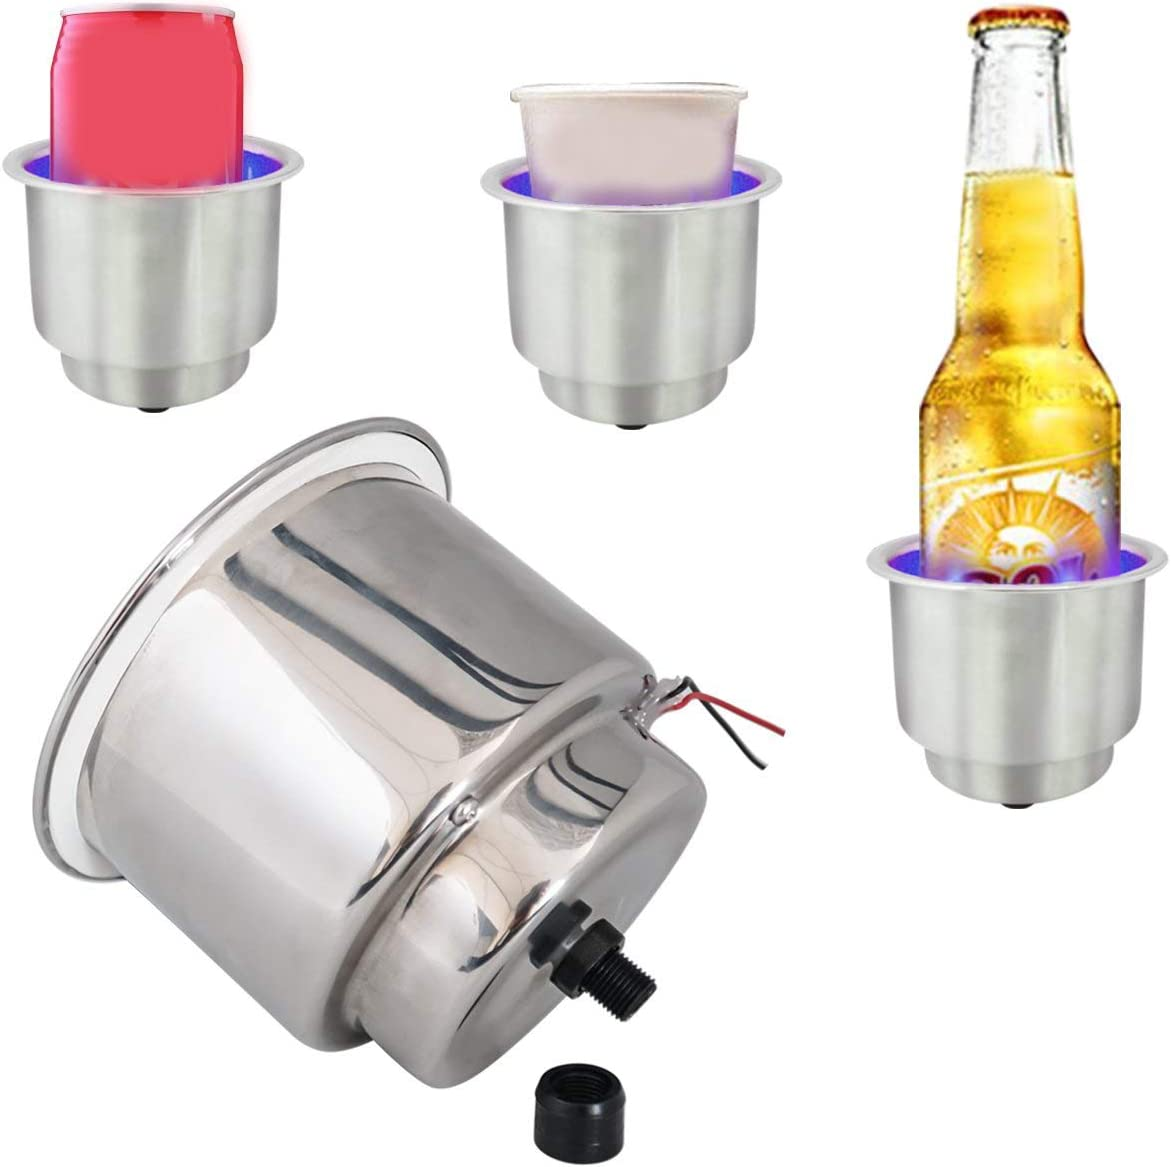 Monland 2 Pcs Led Light Drink Holder Blue 8 Led Recessed Stainless Steel Cup Drink Holder Cup Shape for Car Marine Boat